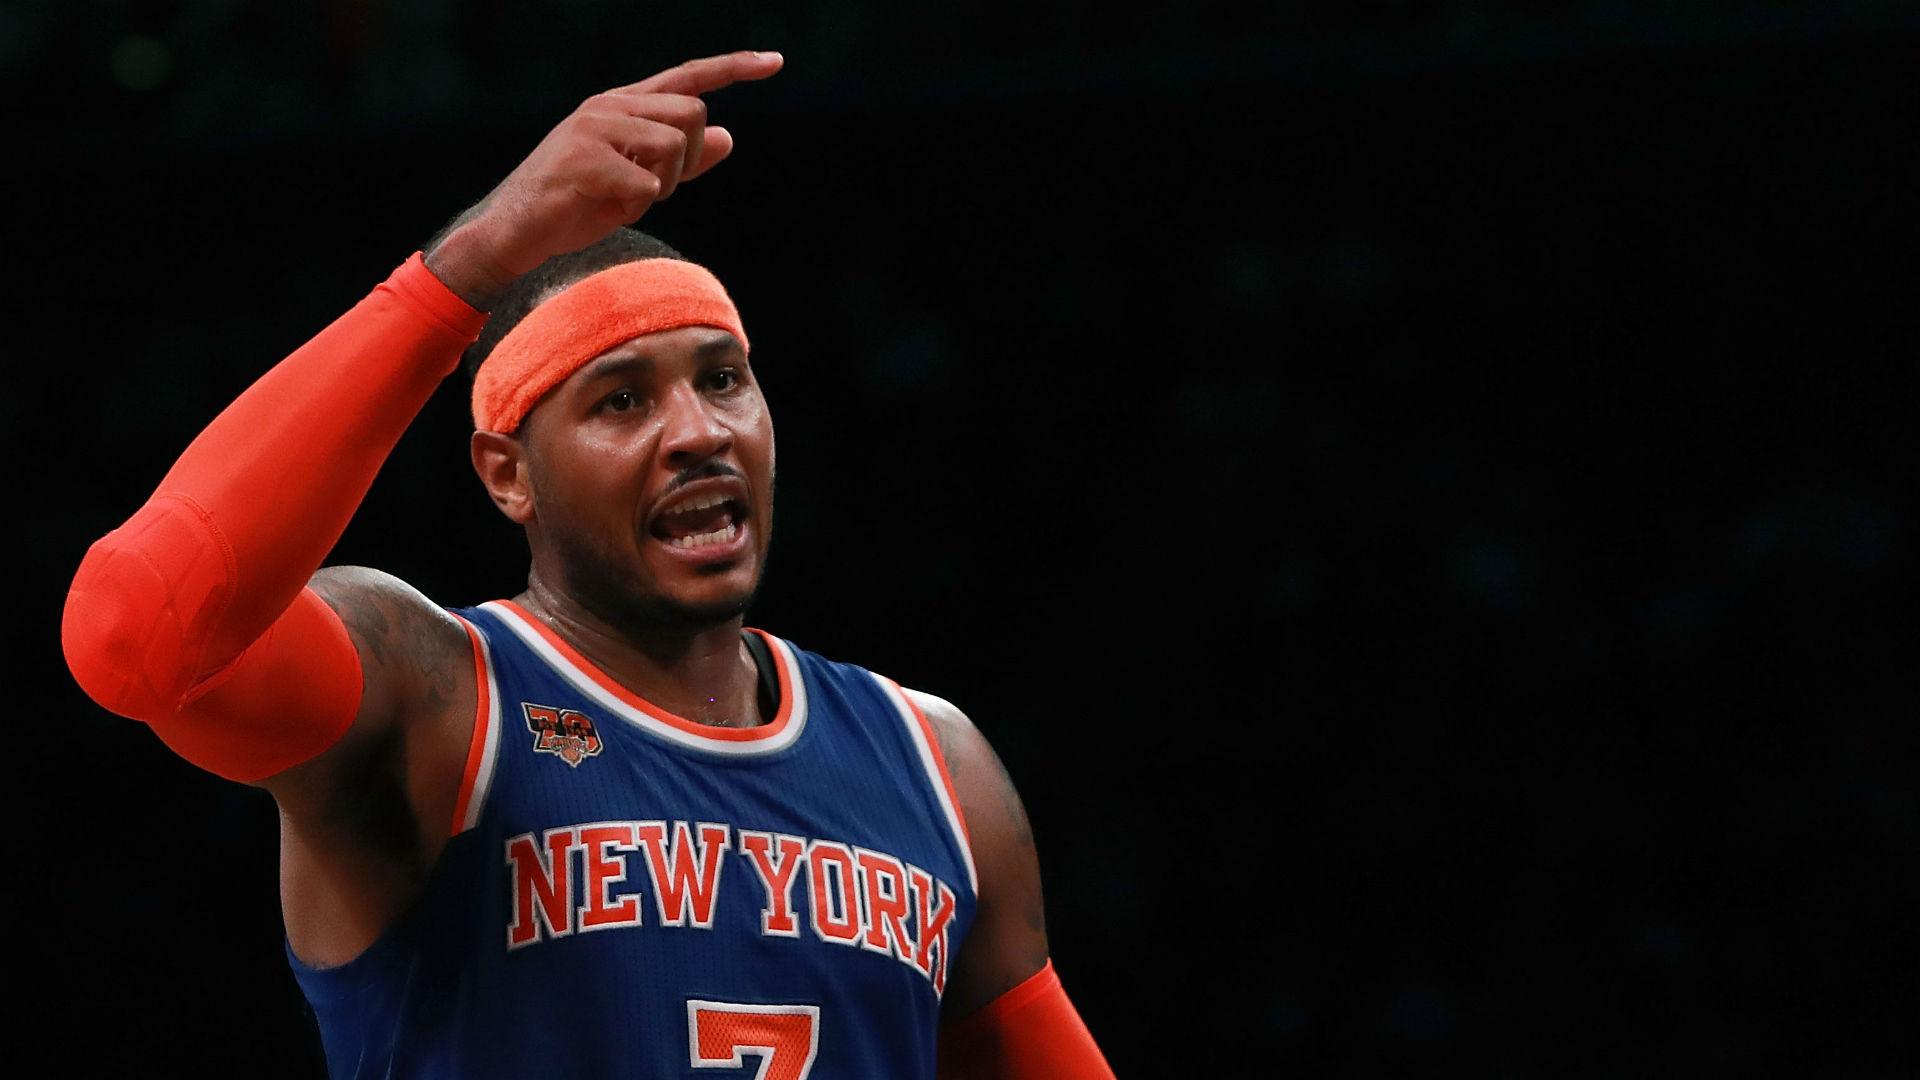 Knicks' Carmelo Anthony Ejected For Hitting Thabo Sefolosha In Throat